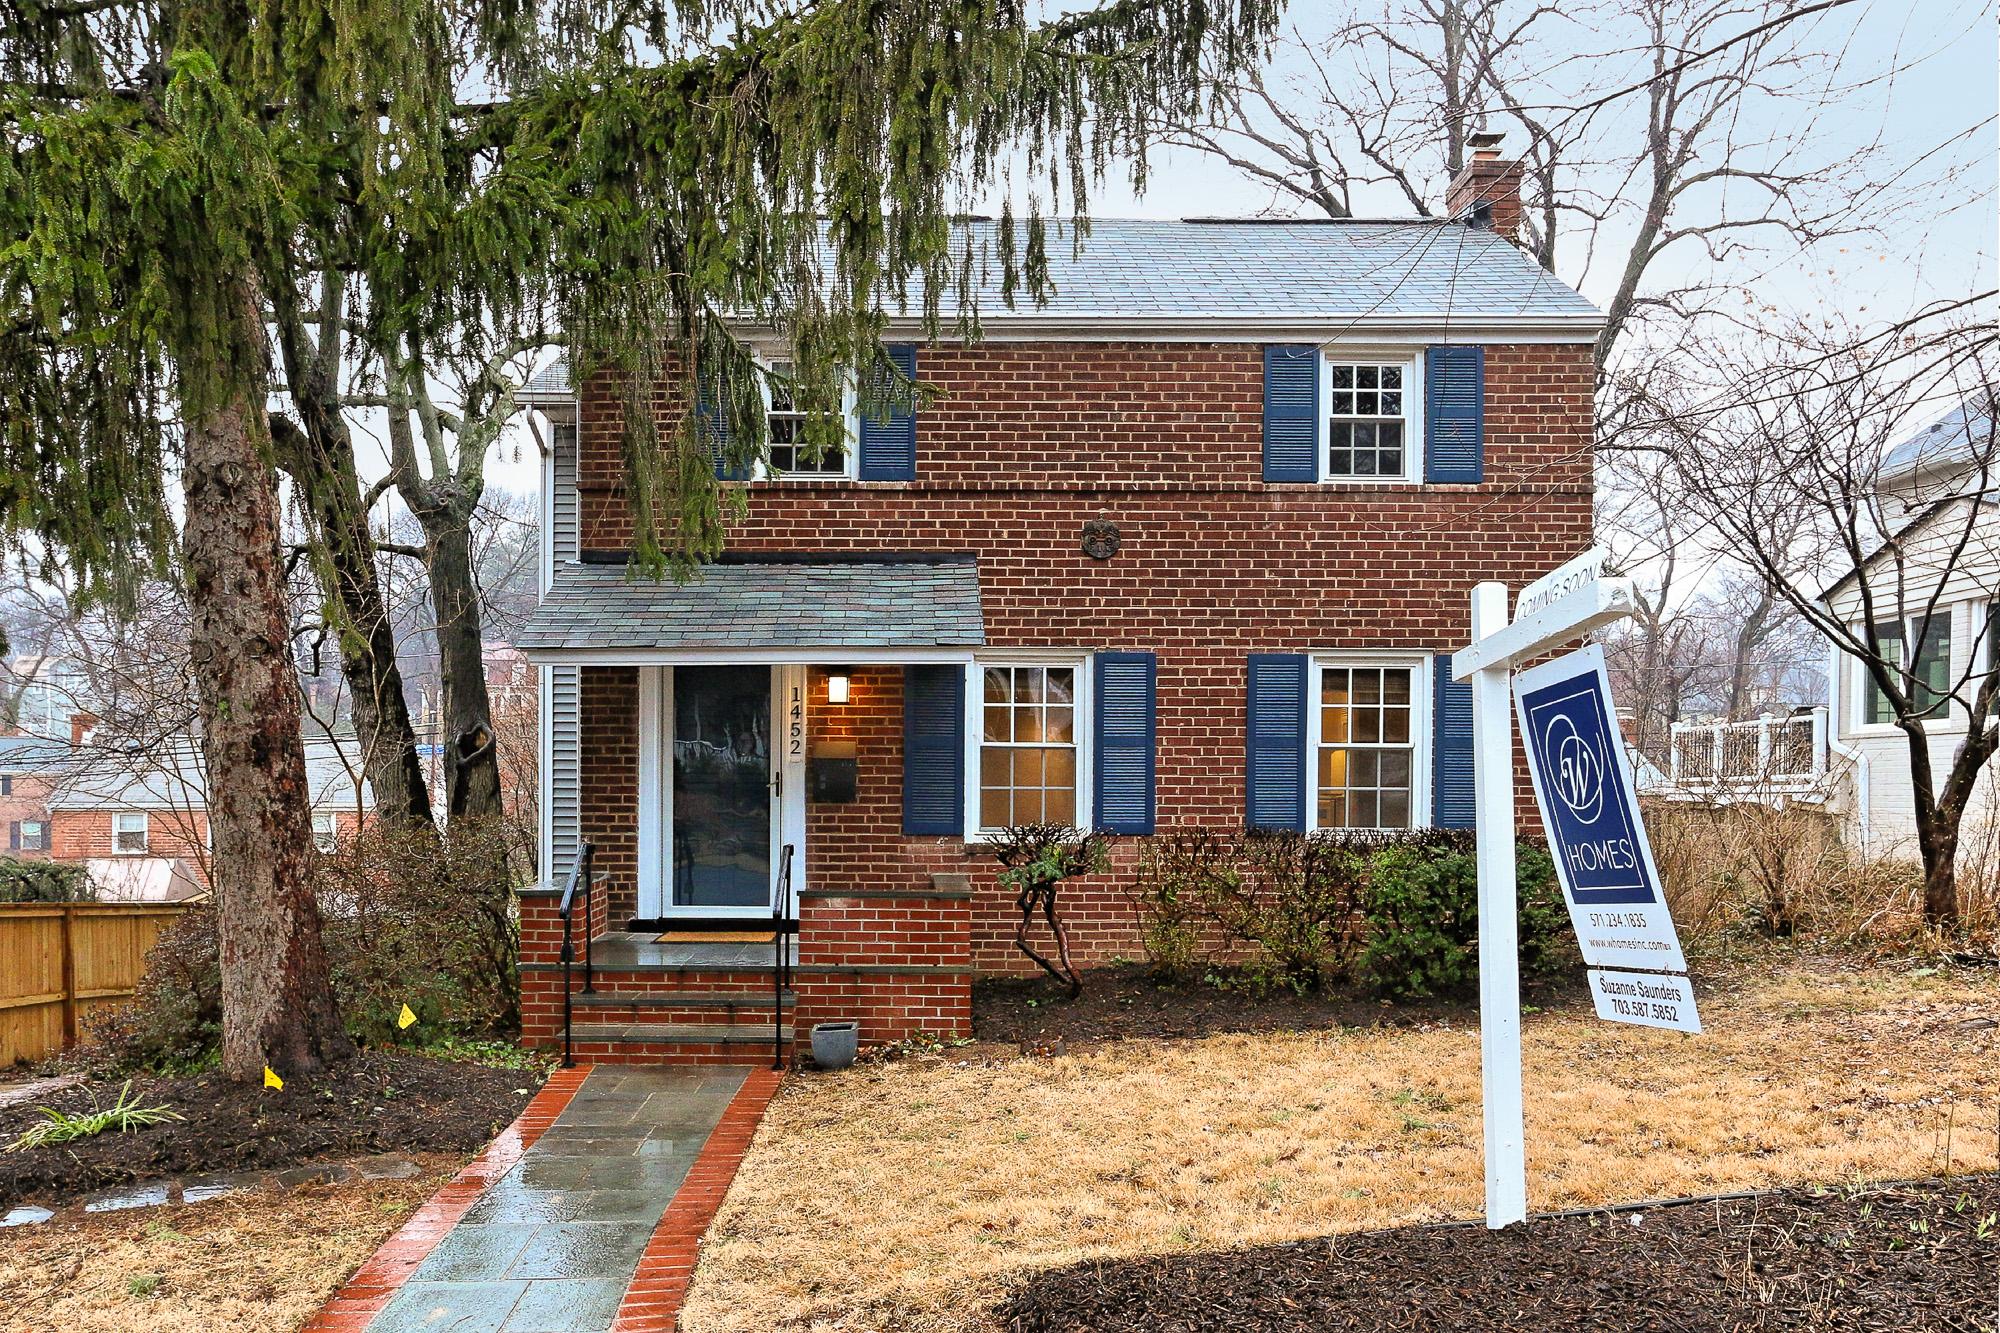 Rustic Brick Home located at 1452 N Longfellow St, Arlington, VA 22205.jpg